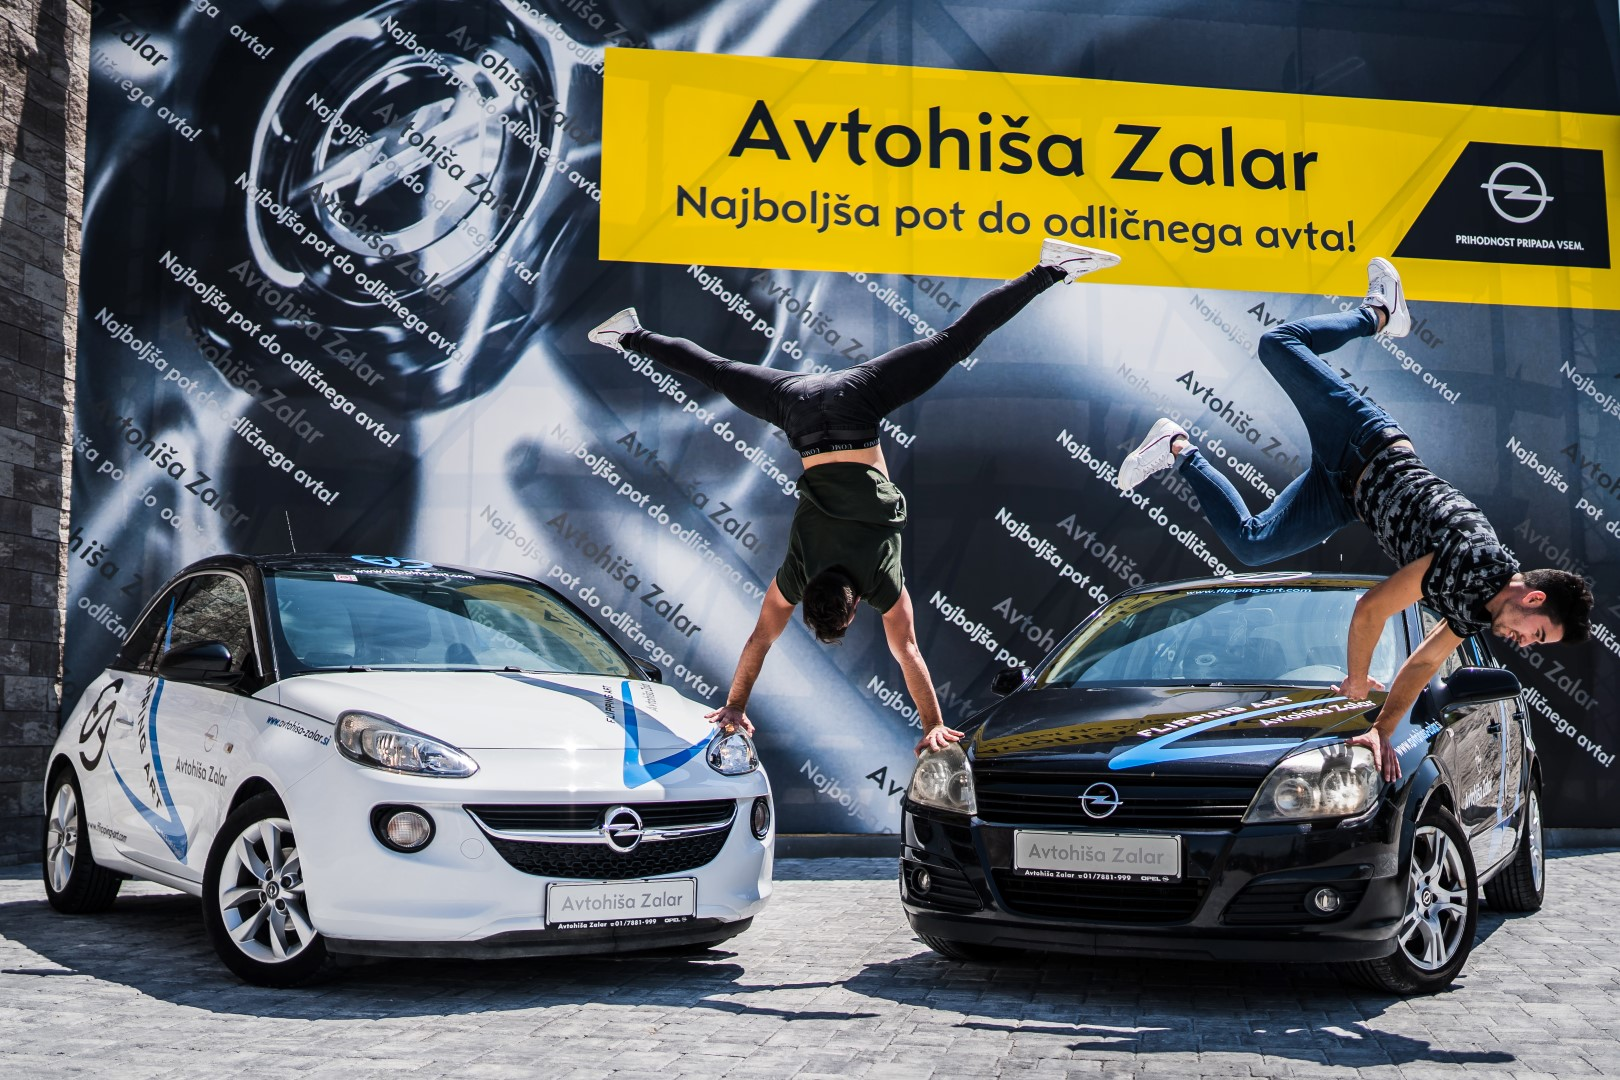 avtohisa-zalar-flipping-art-slovenija-ima-talent (8)